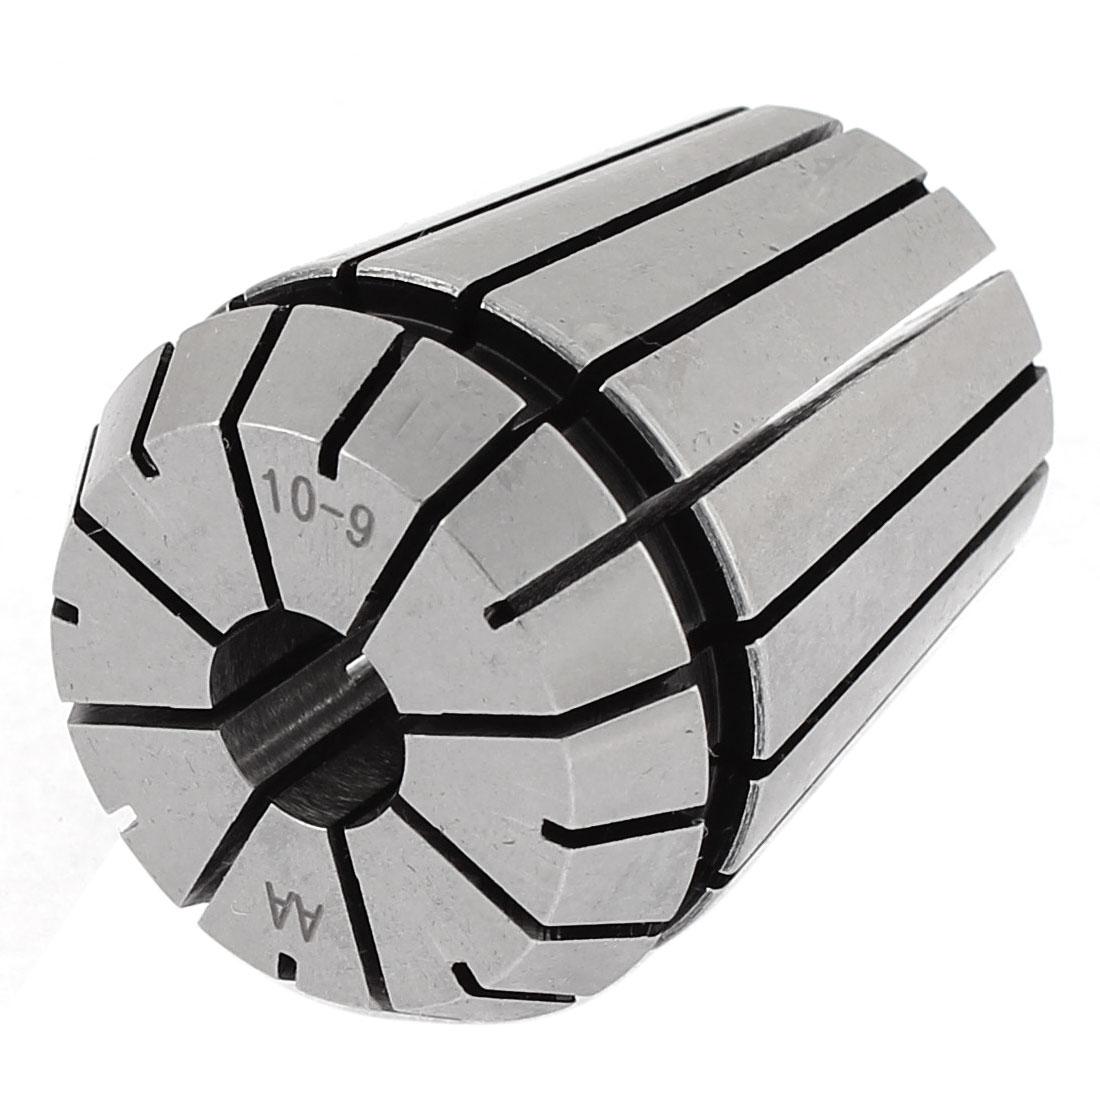 ER32 10mm Stainless Steel Spring Collet Holder CNC Milling Lathe Tool 10-9mm Clamp Range